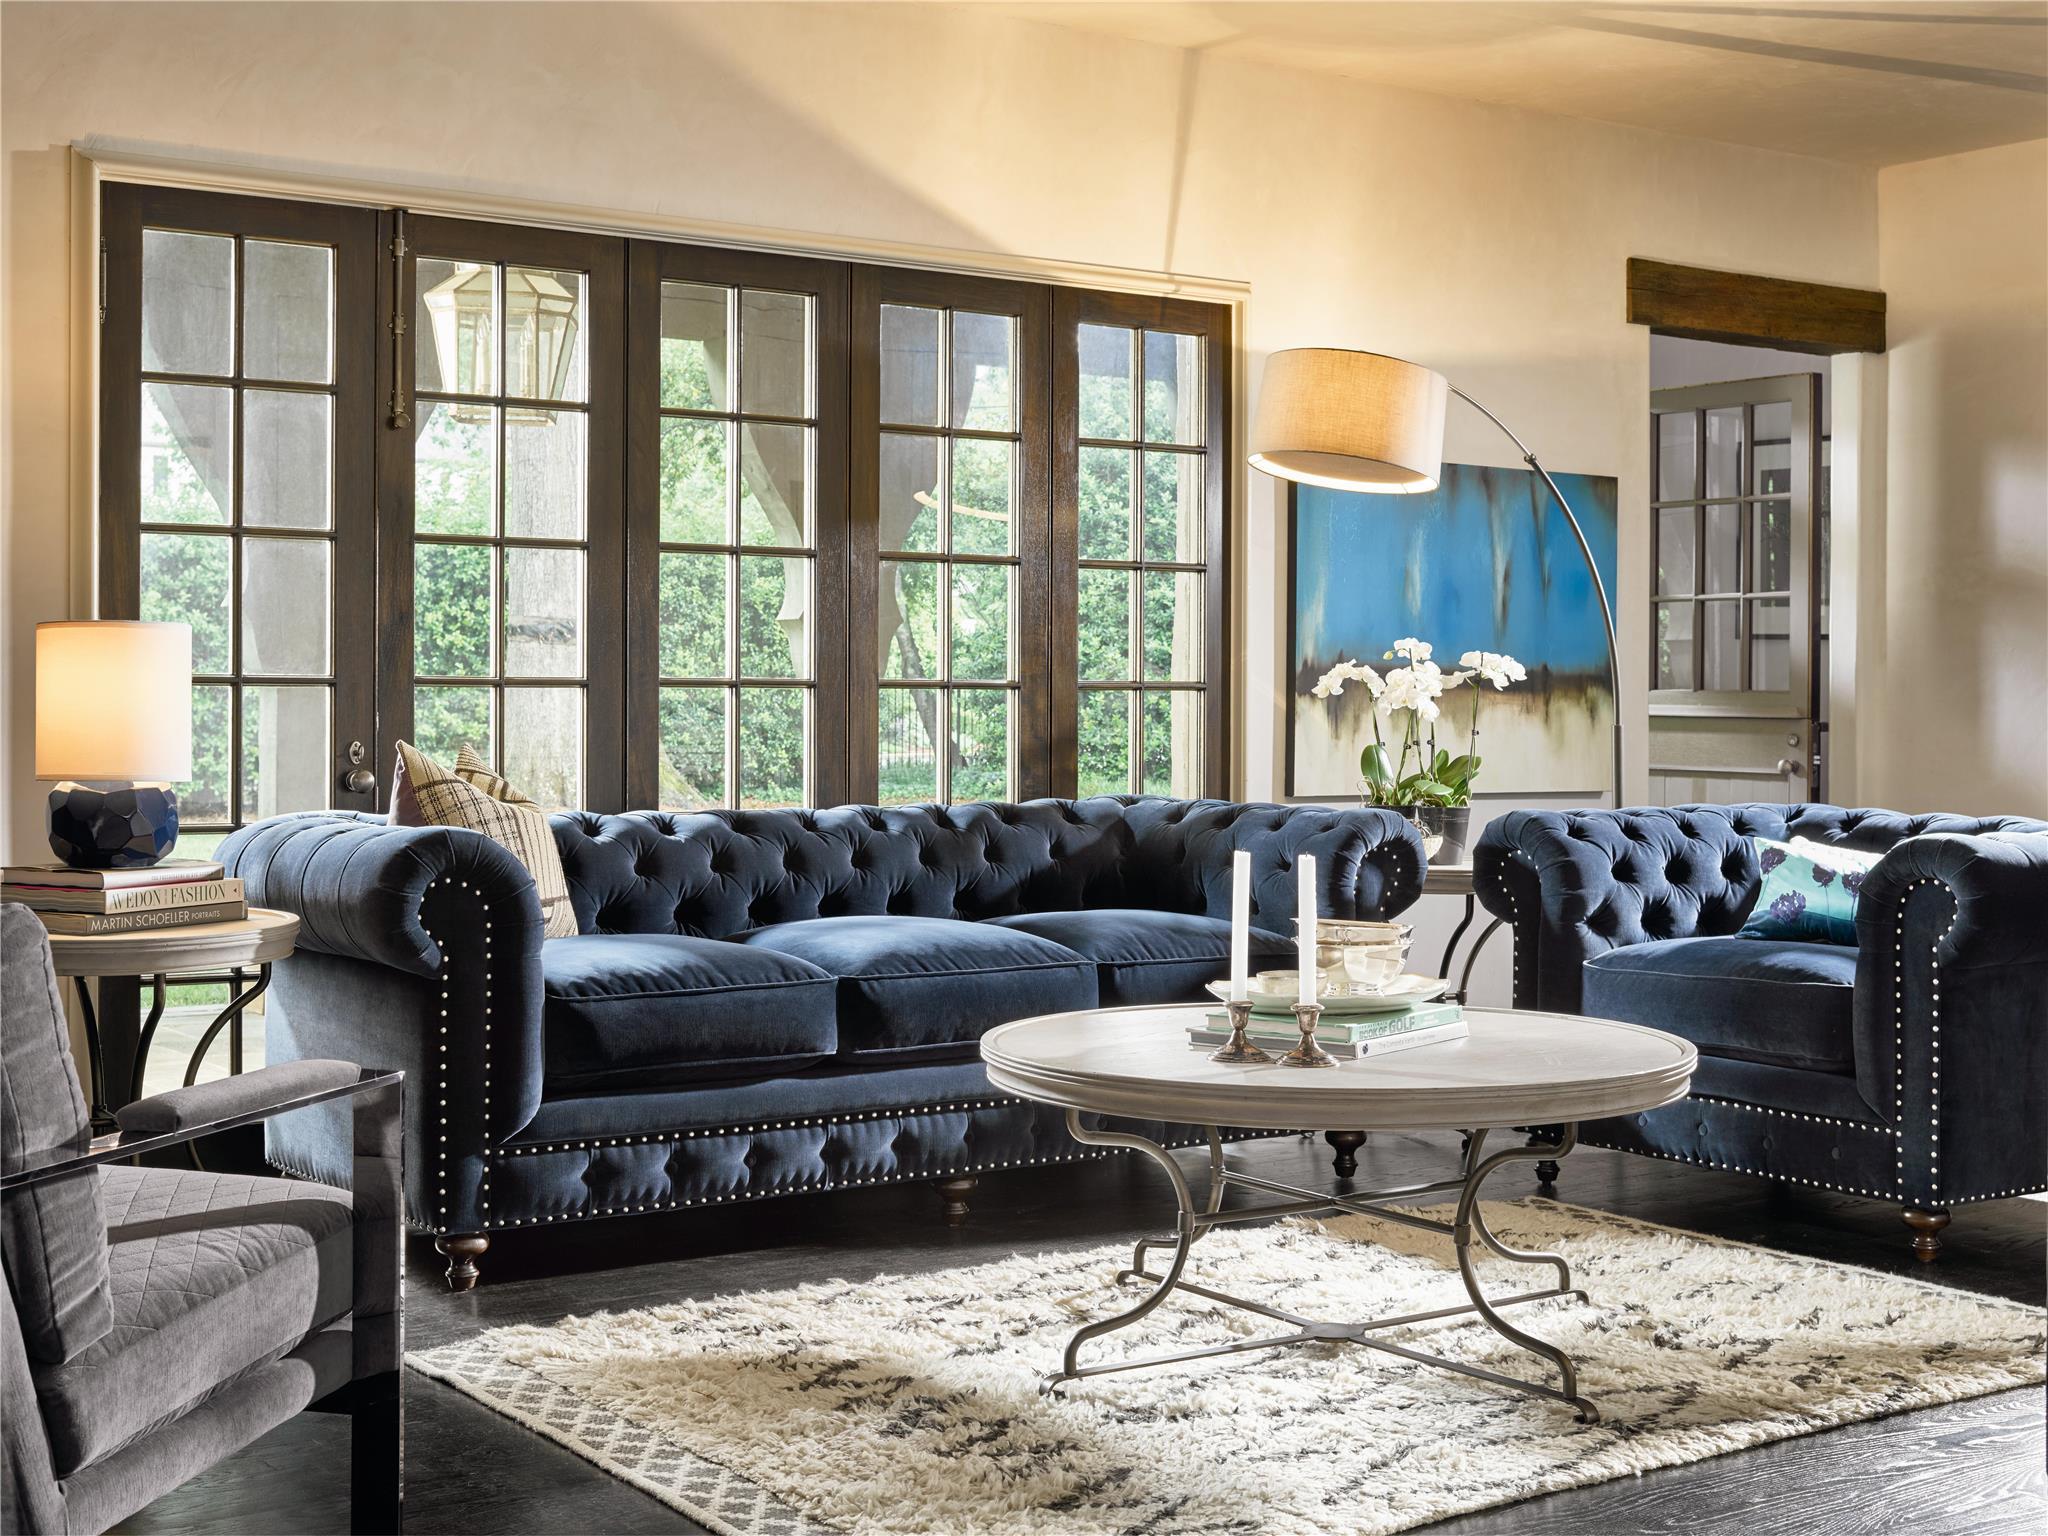 Merveilleux Belgian Style Family Room Furniture